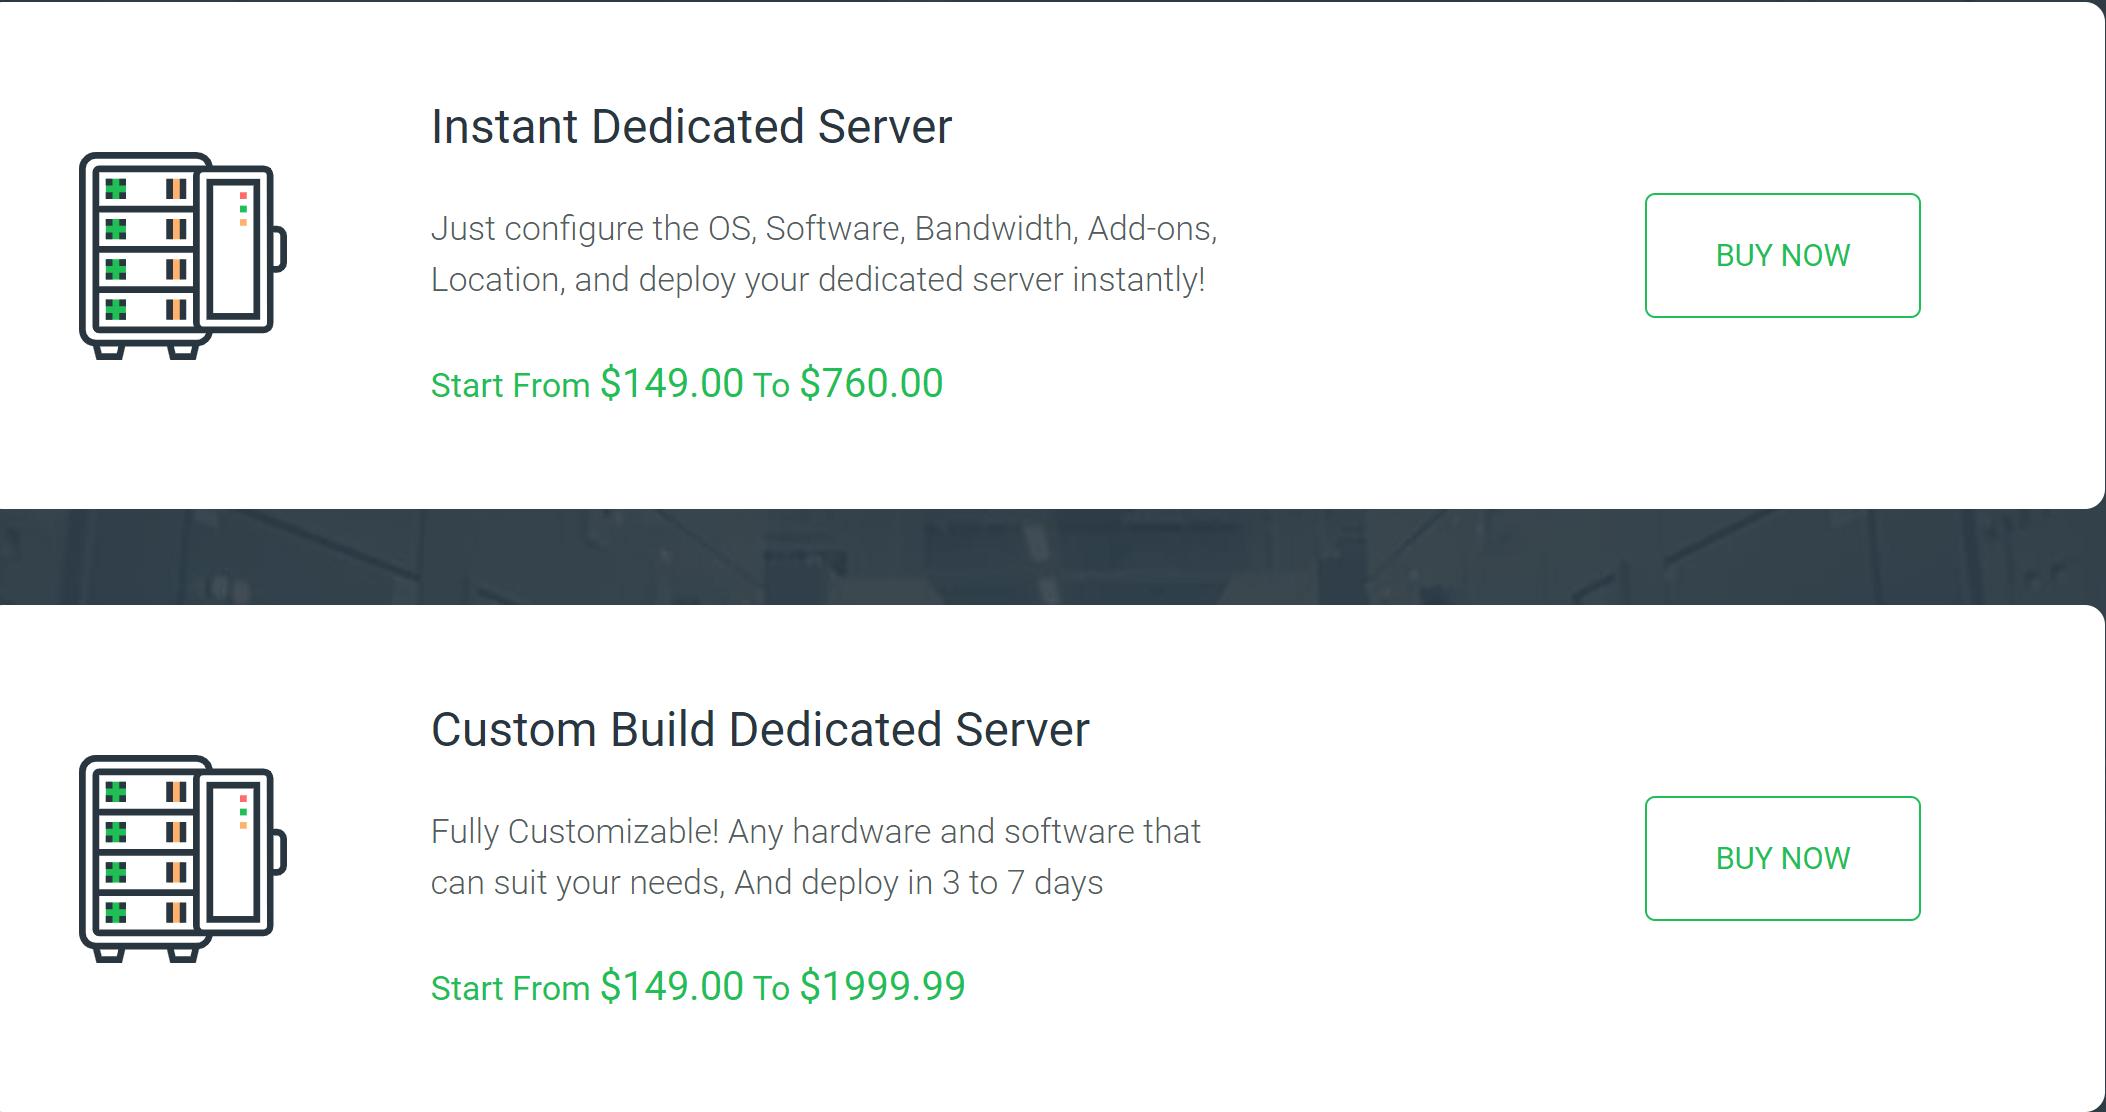 Opera VPS Dedicated server pricing plans